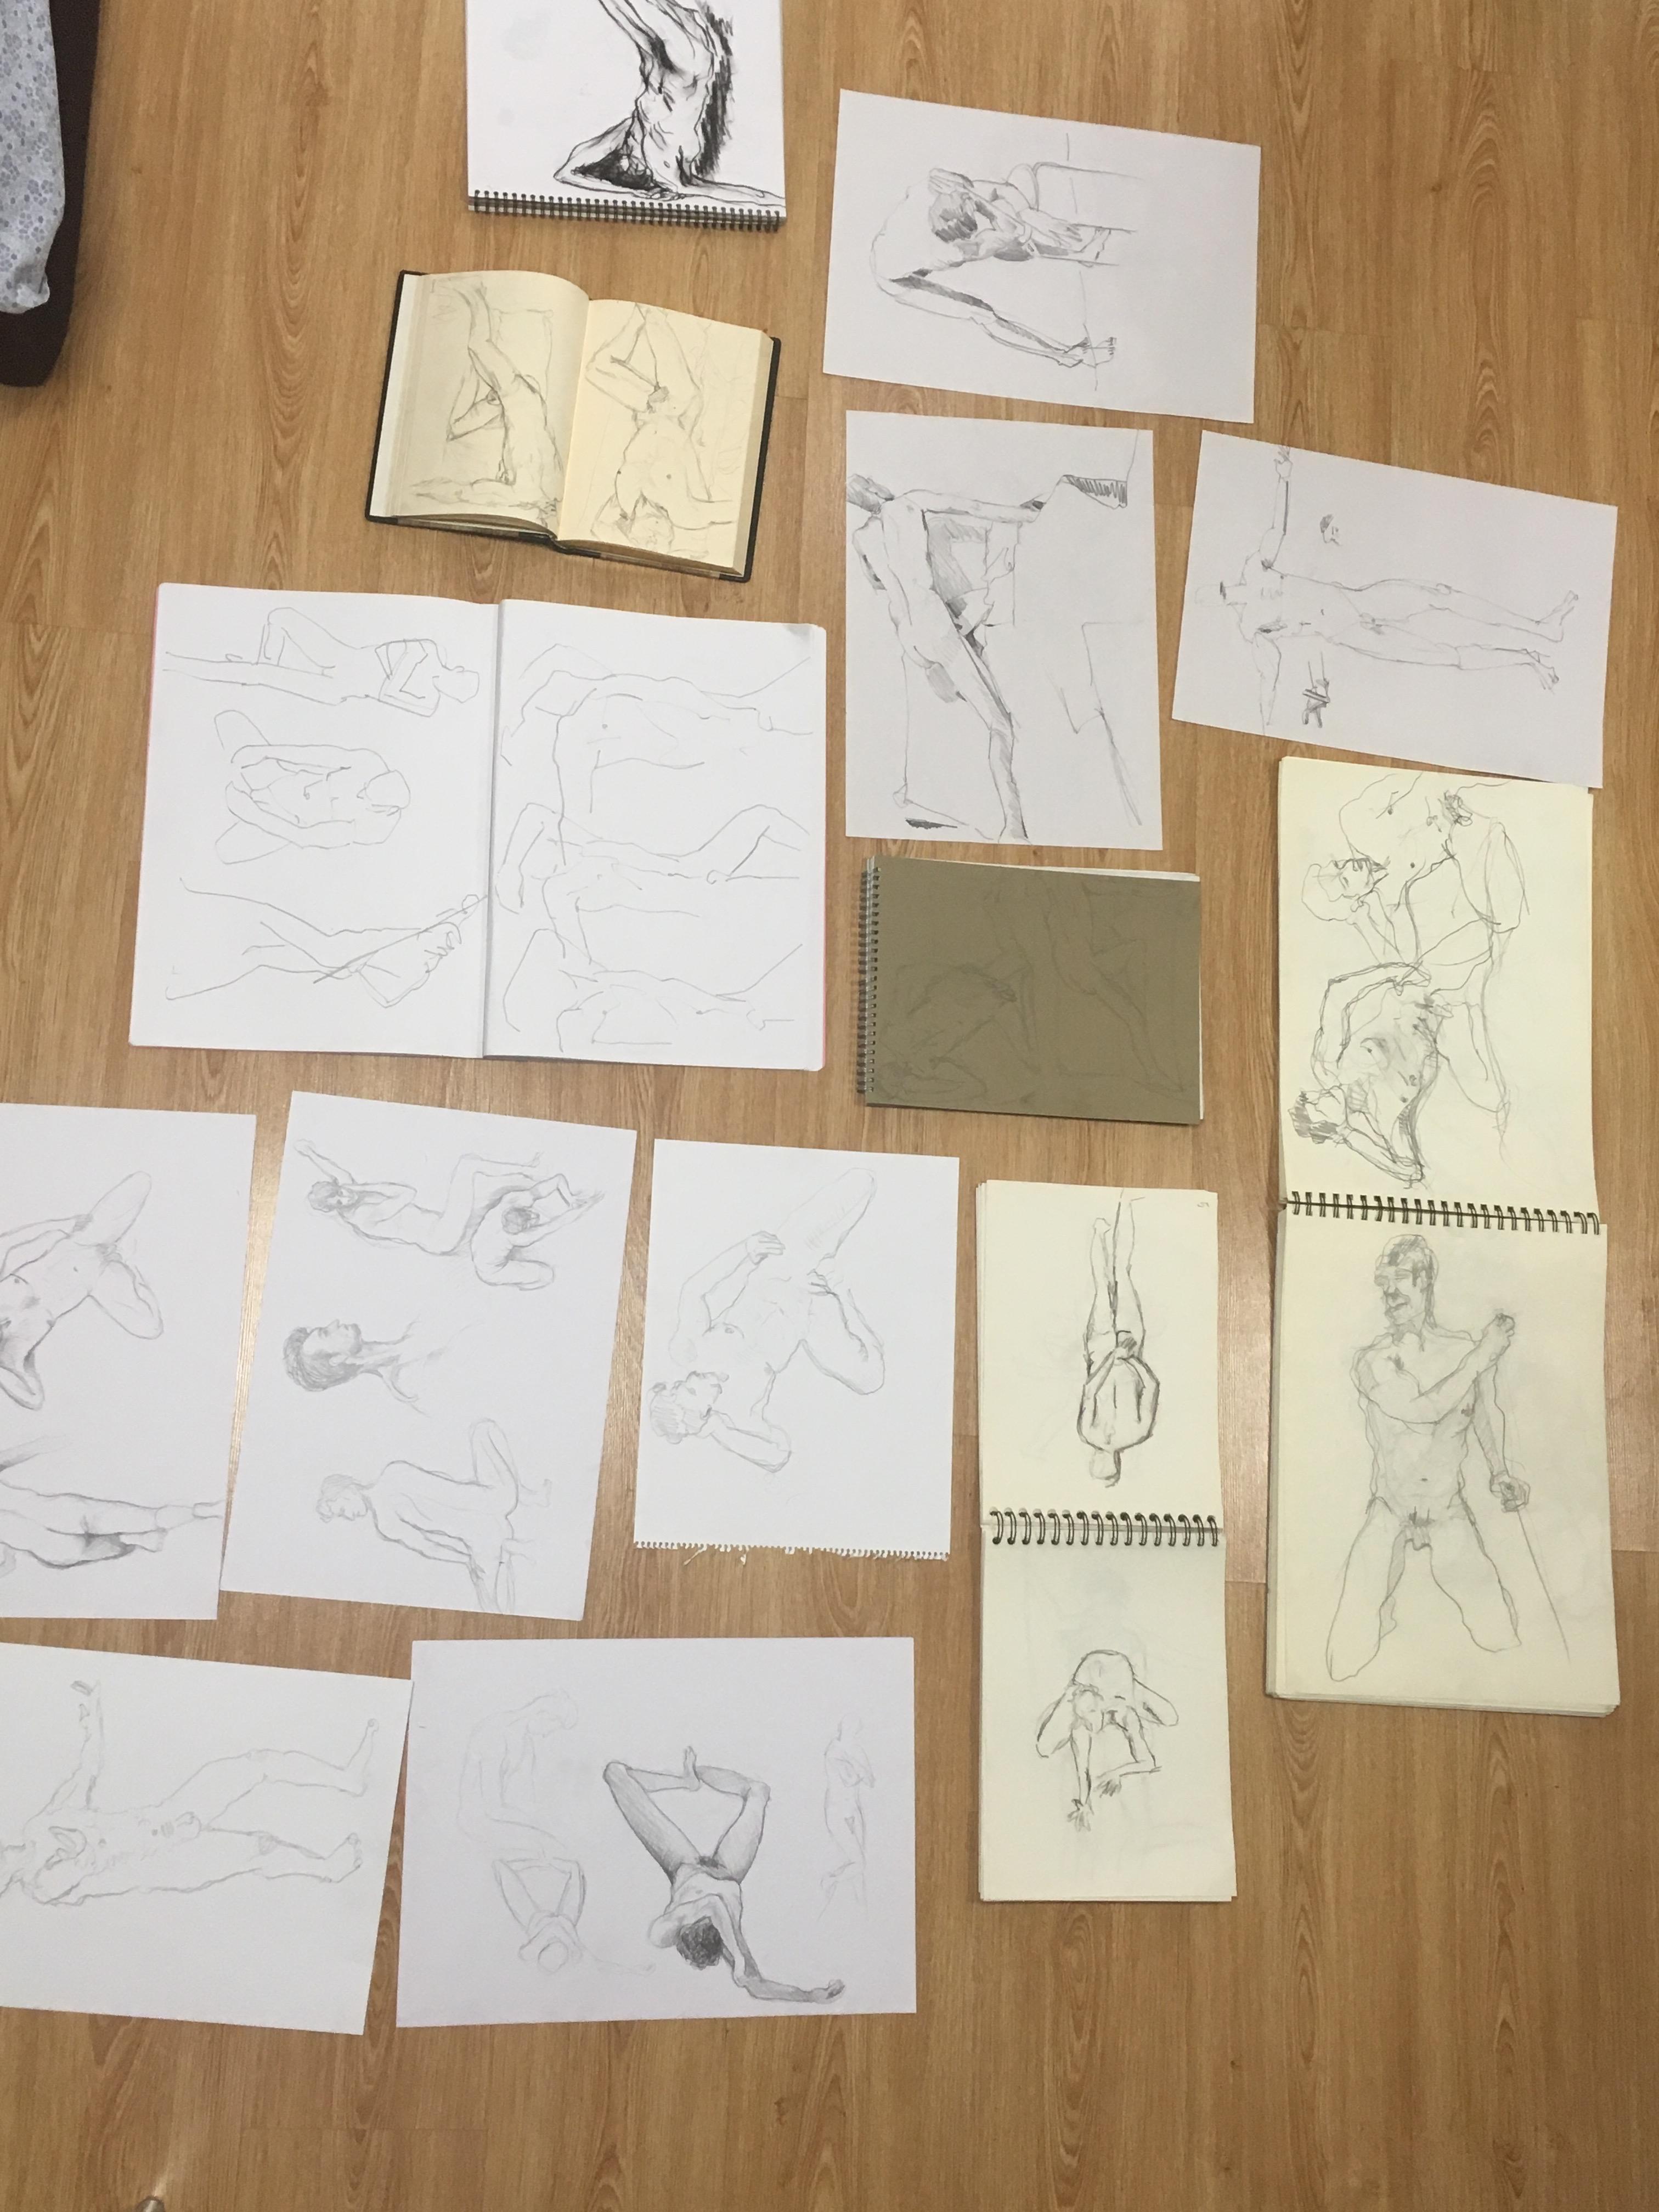 Atelier de dessin